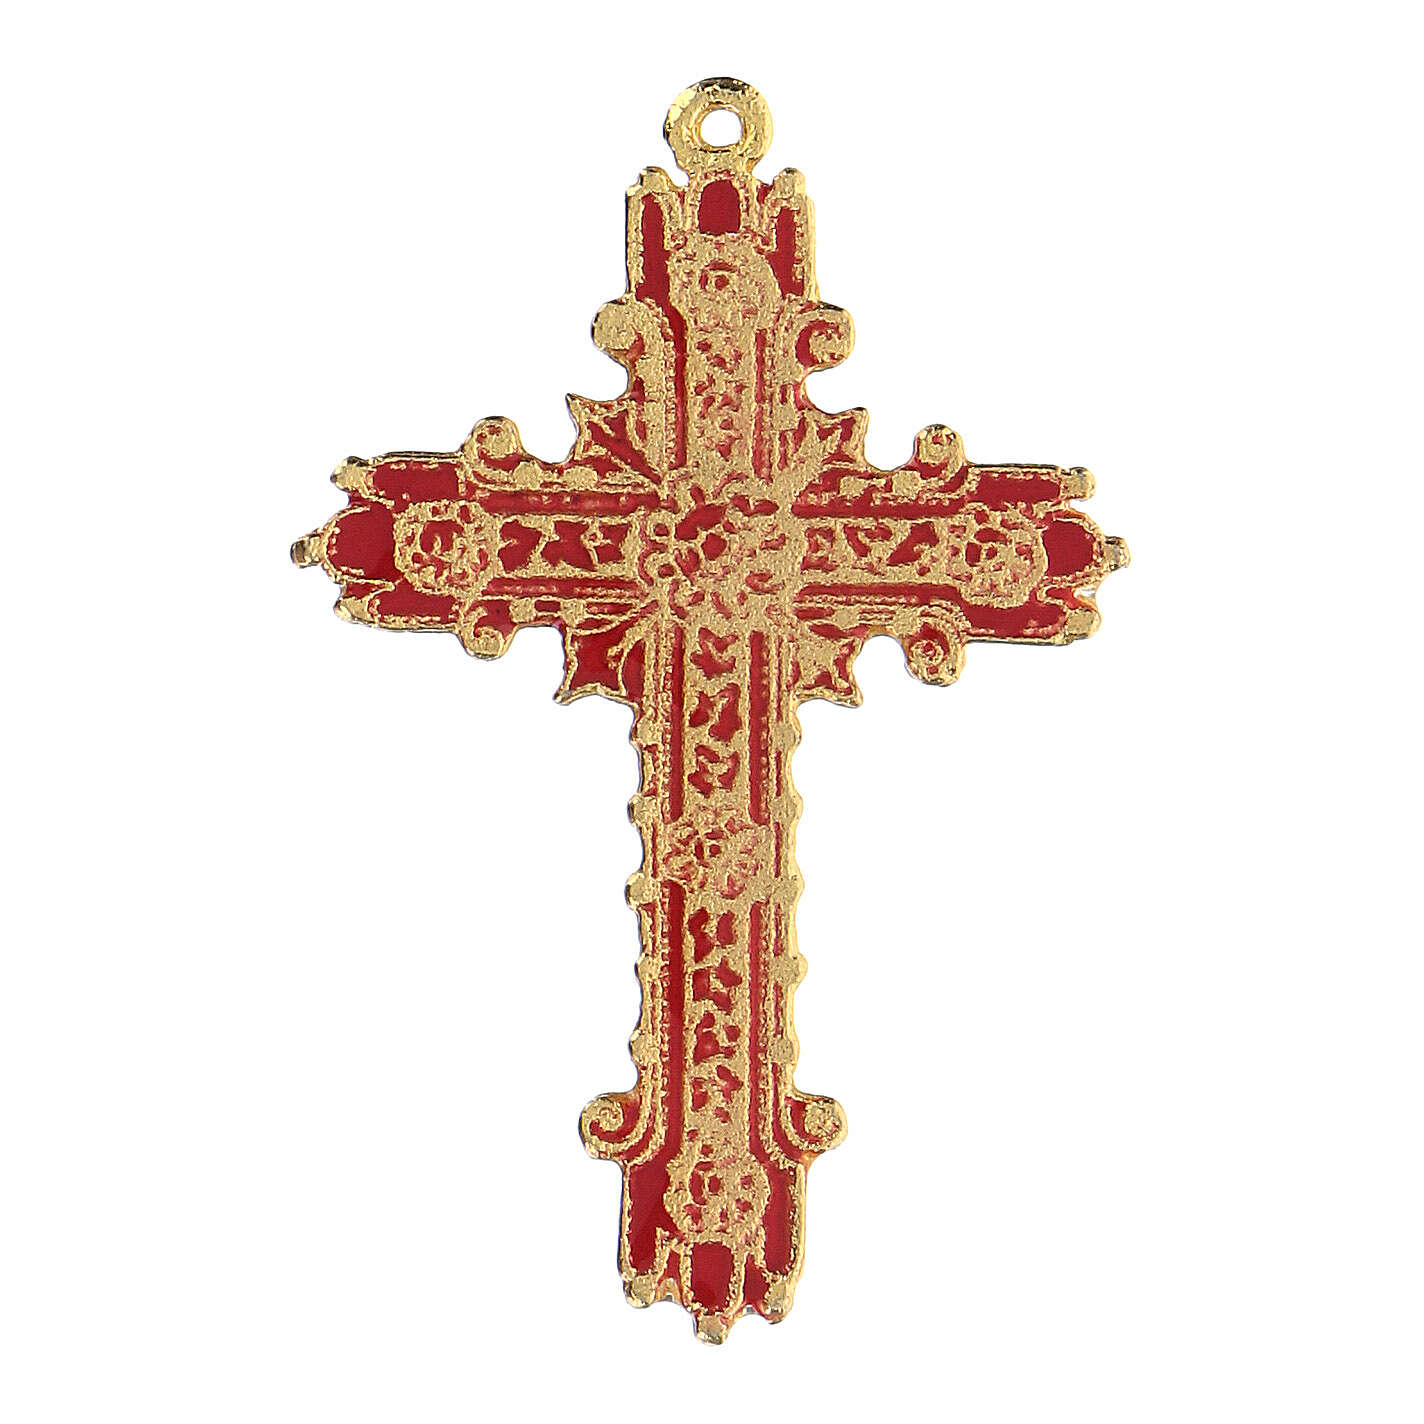 Golden cross pendant with coral enamel 4